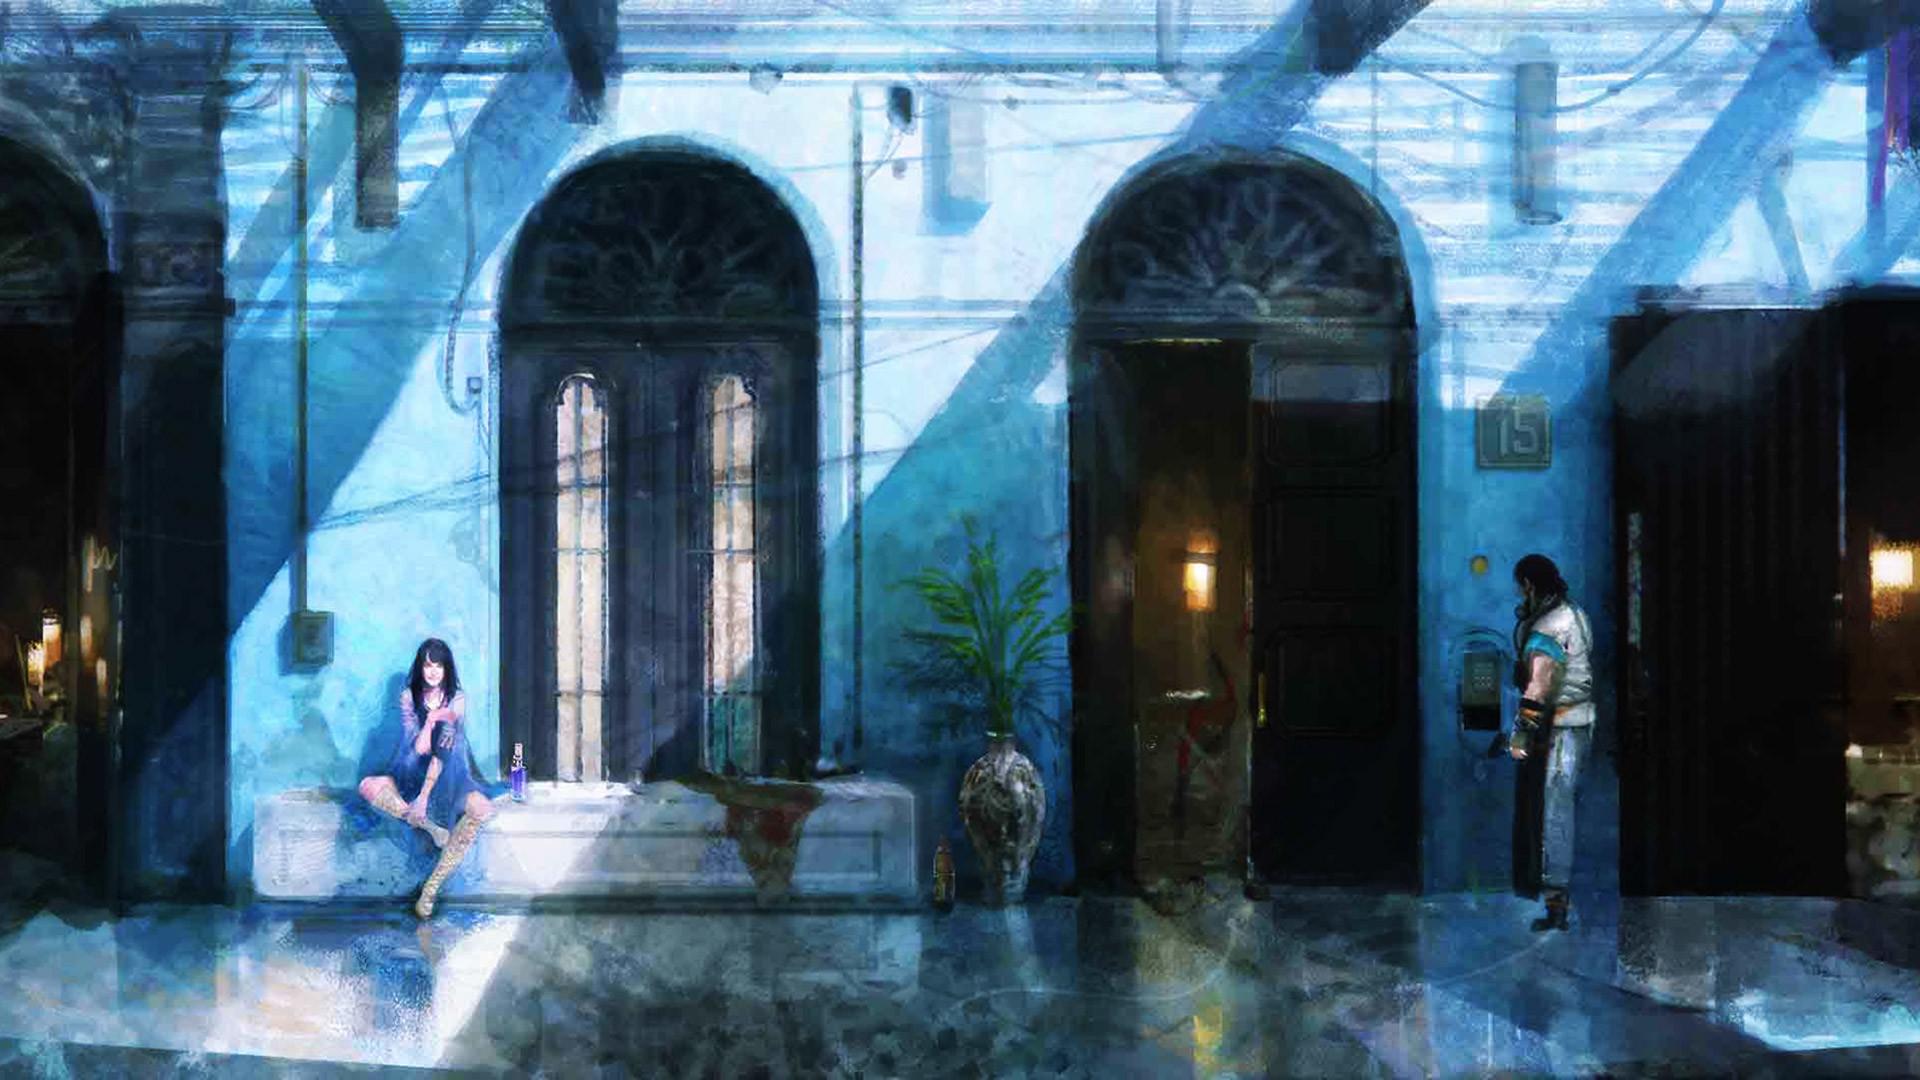 Free Final Fantasy XV Wallpaper in 1920×1080